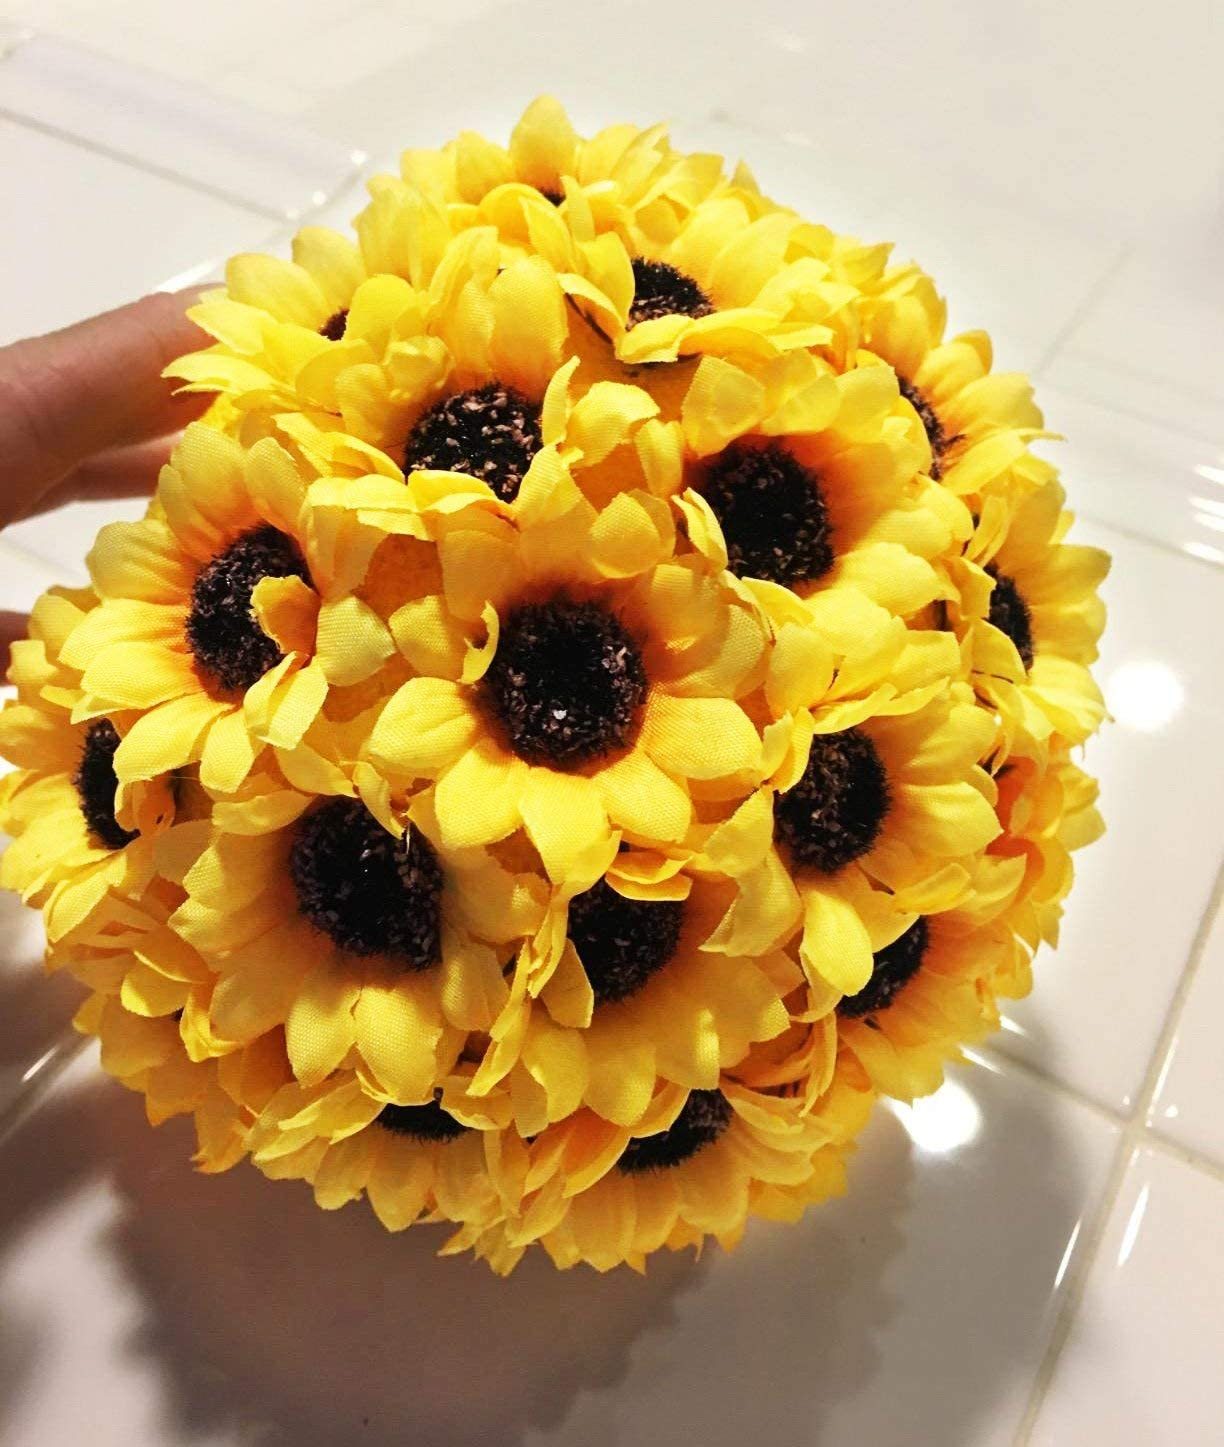 Bride Holding Flowers,Garden Craft Art Decor KINWELL 100pcs Artificial Silk Yellow Sunflower Heads 2.8 Fabric Floral for Home Decoration Wedding Decor